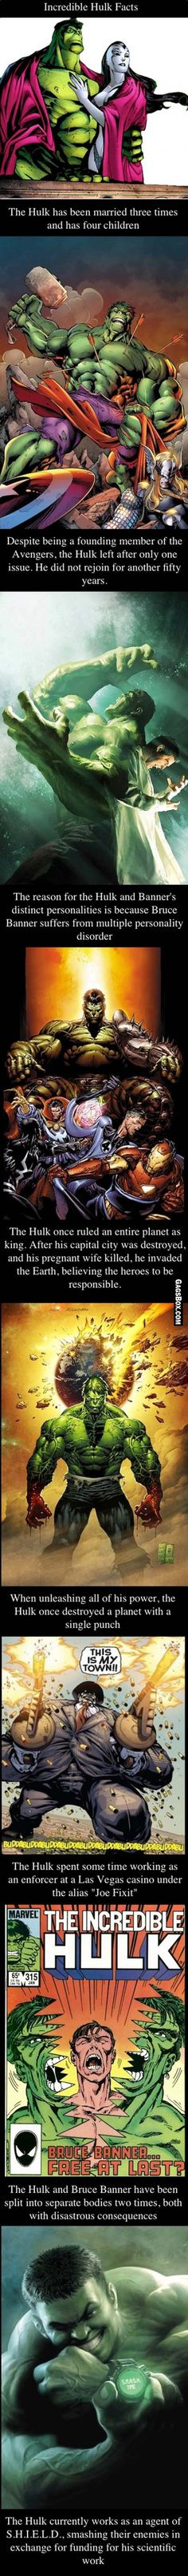 Incredible Hulk Facts